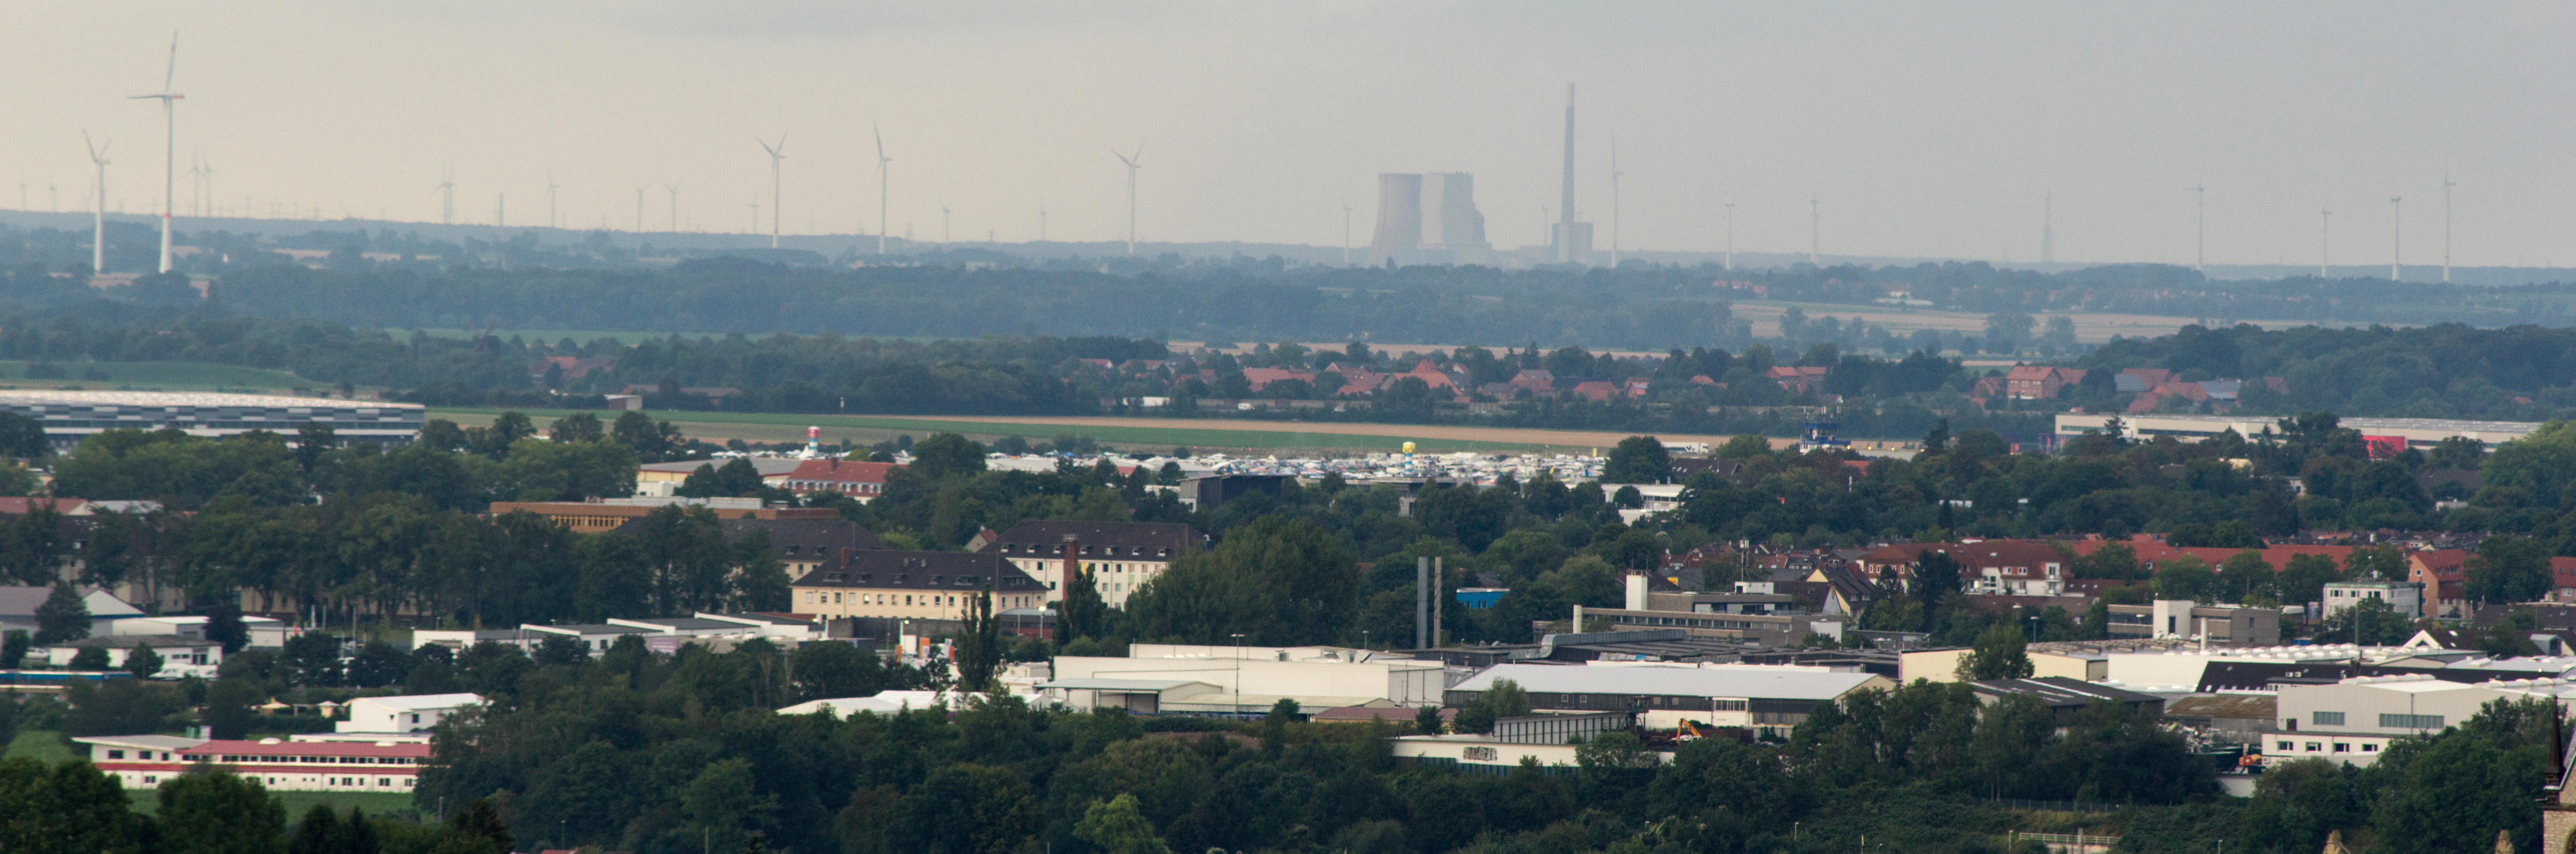 Hildesheim_138